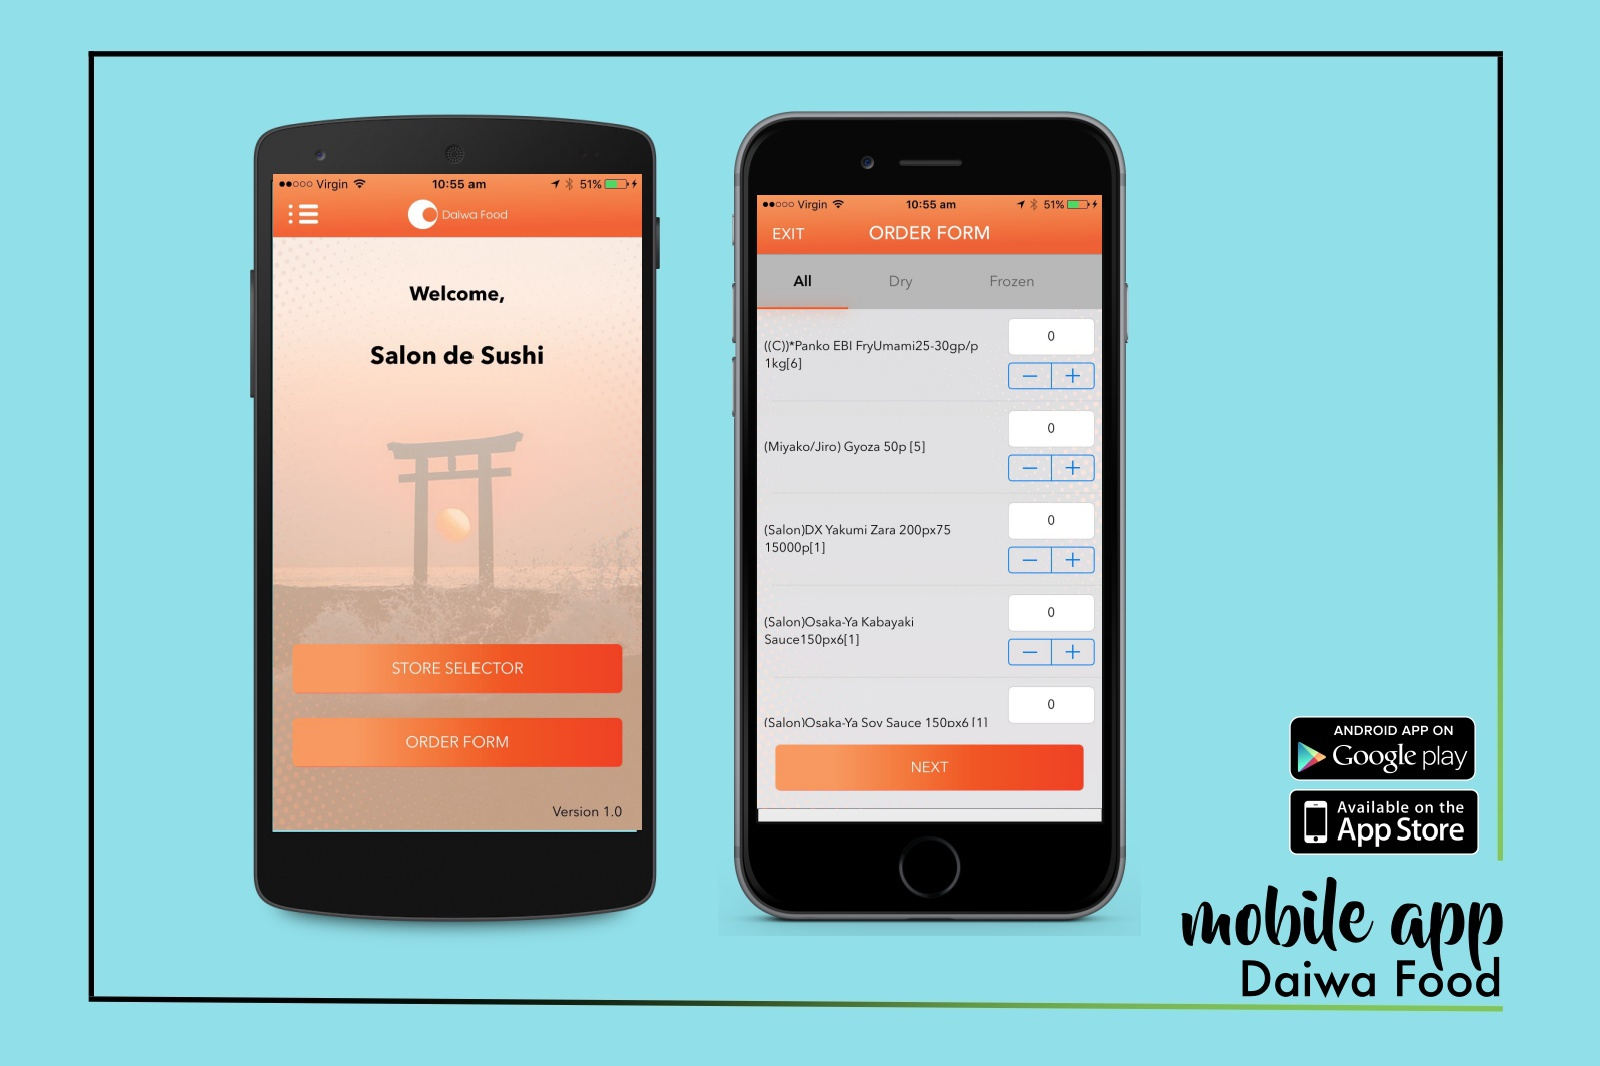 Daiwa Food Mobile App